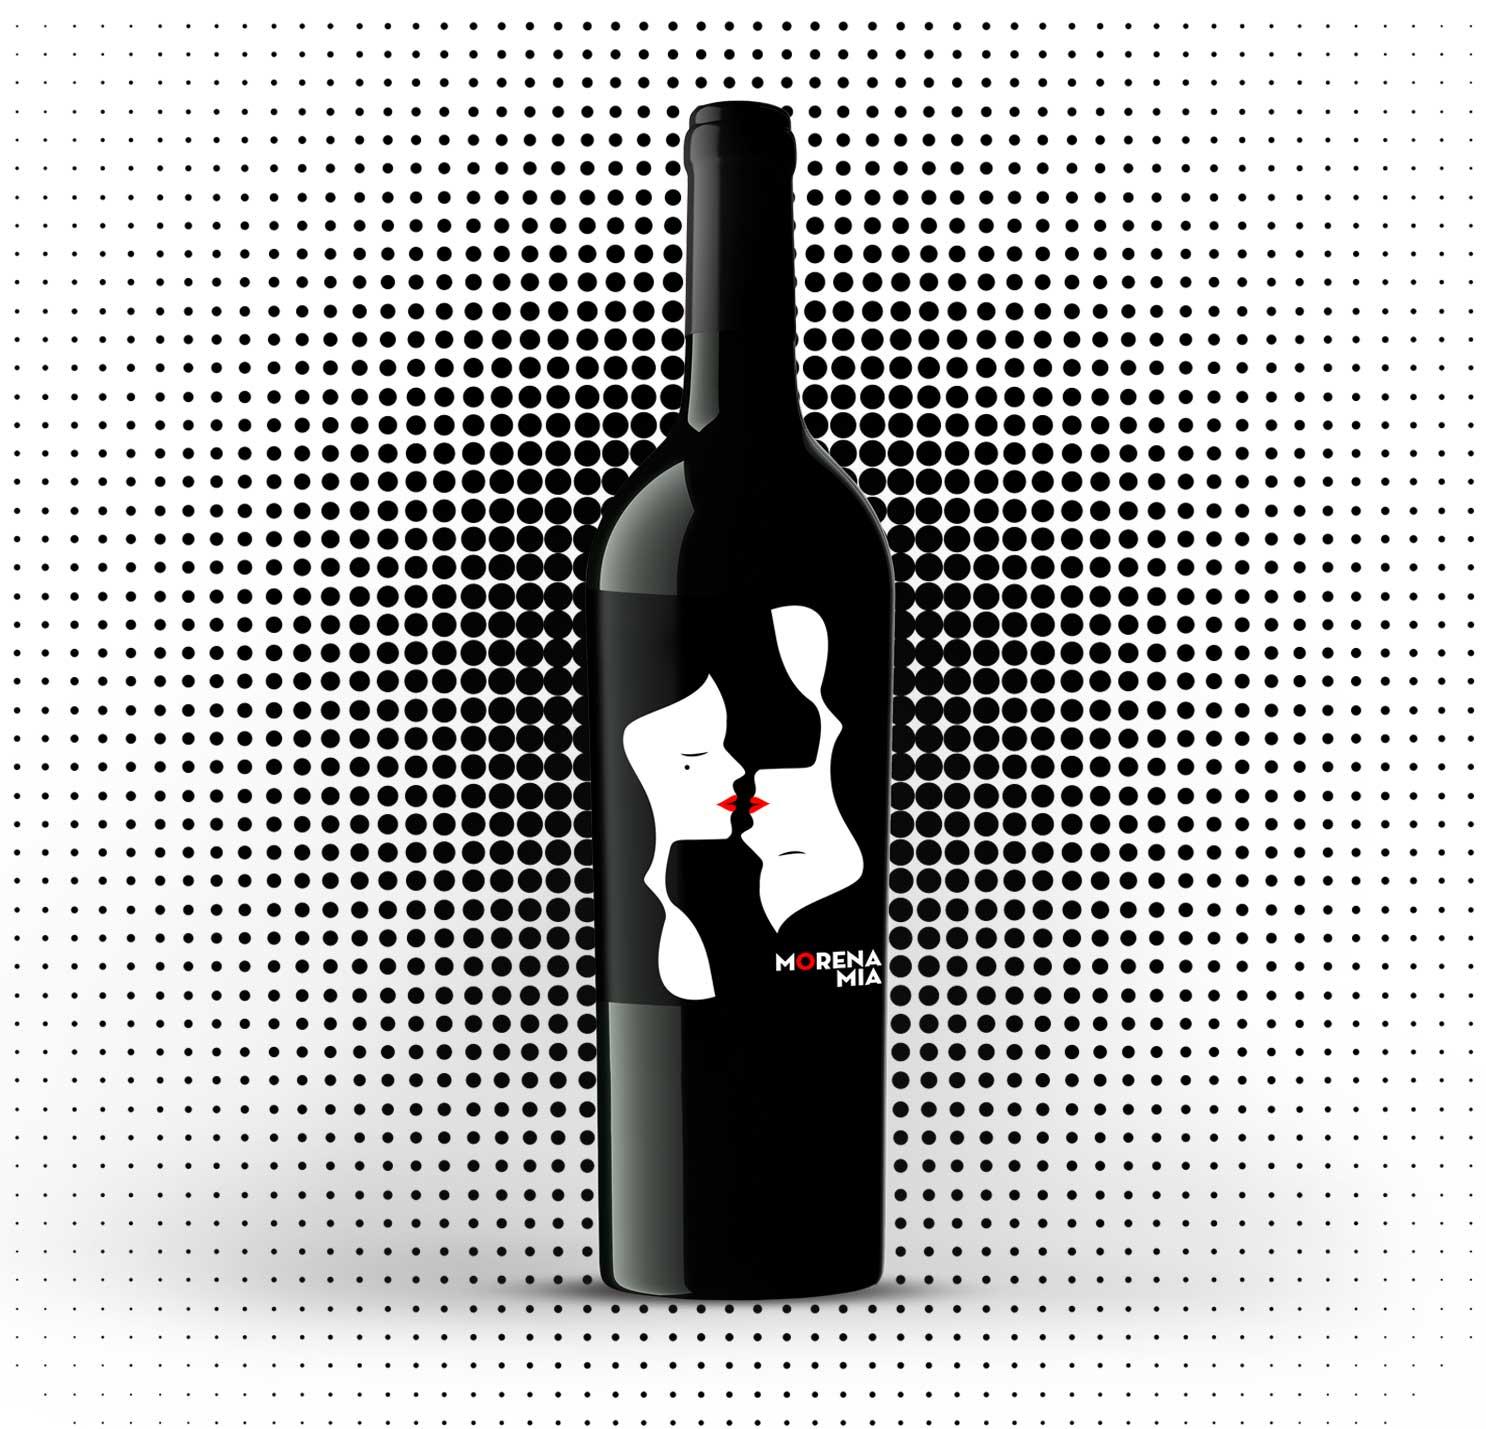 diseño de etiquetas de vino-barrica creativa-morenamia